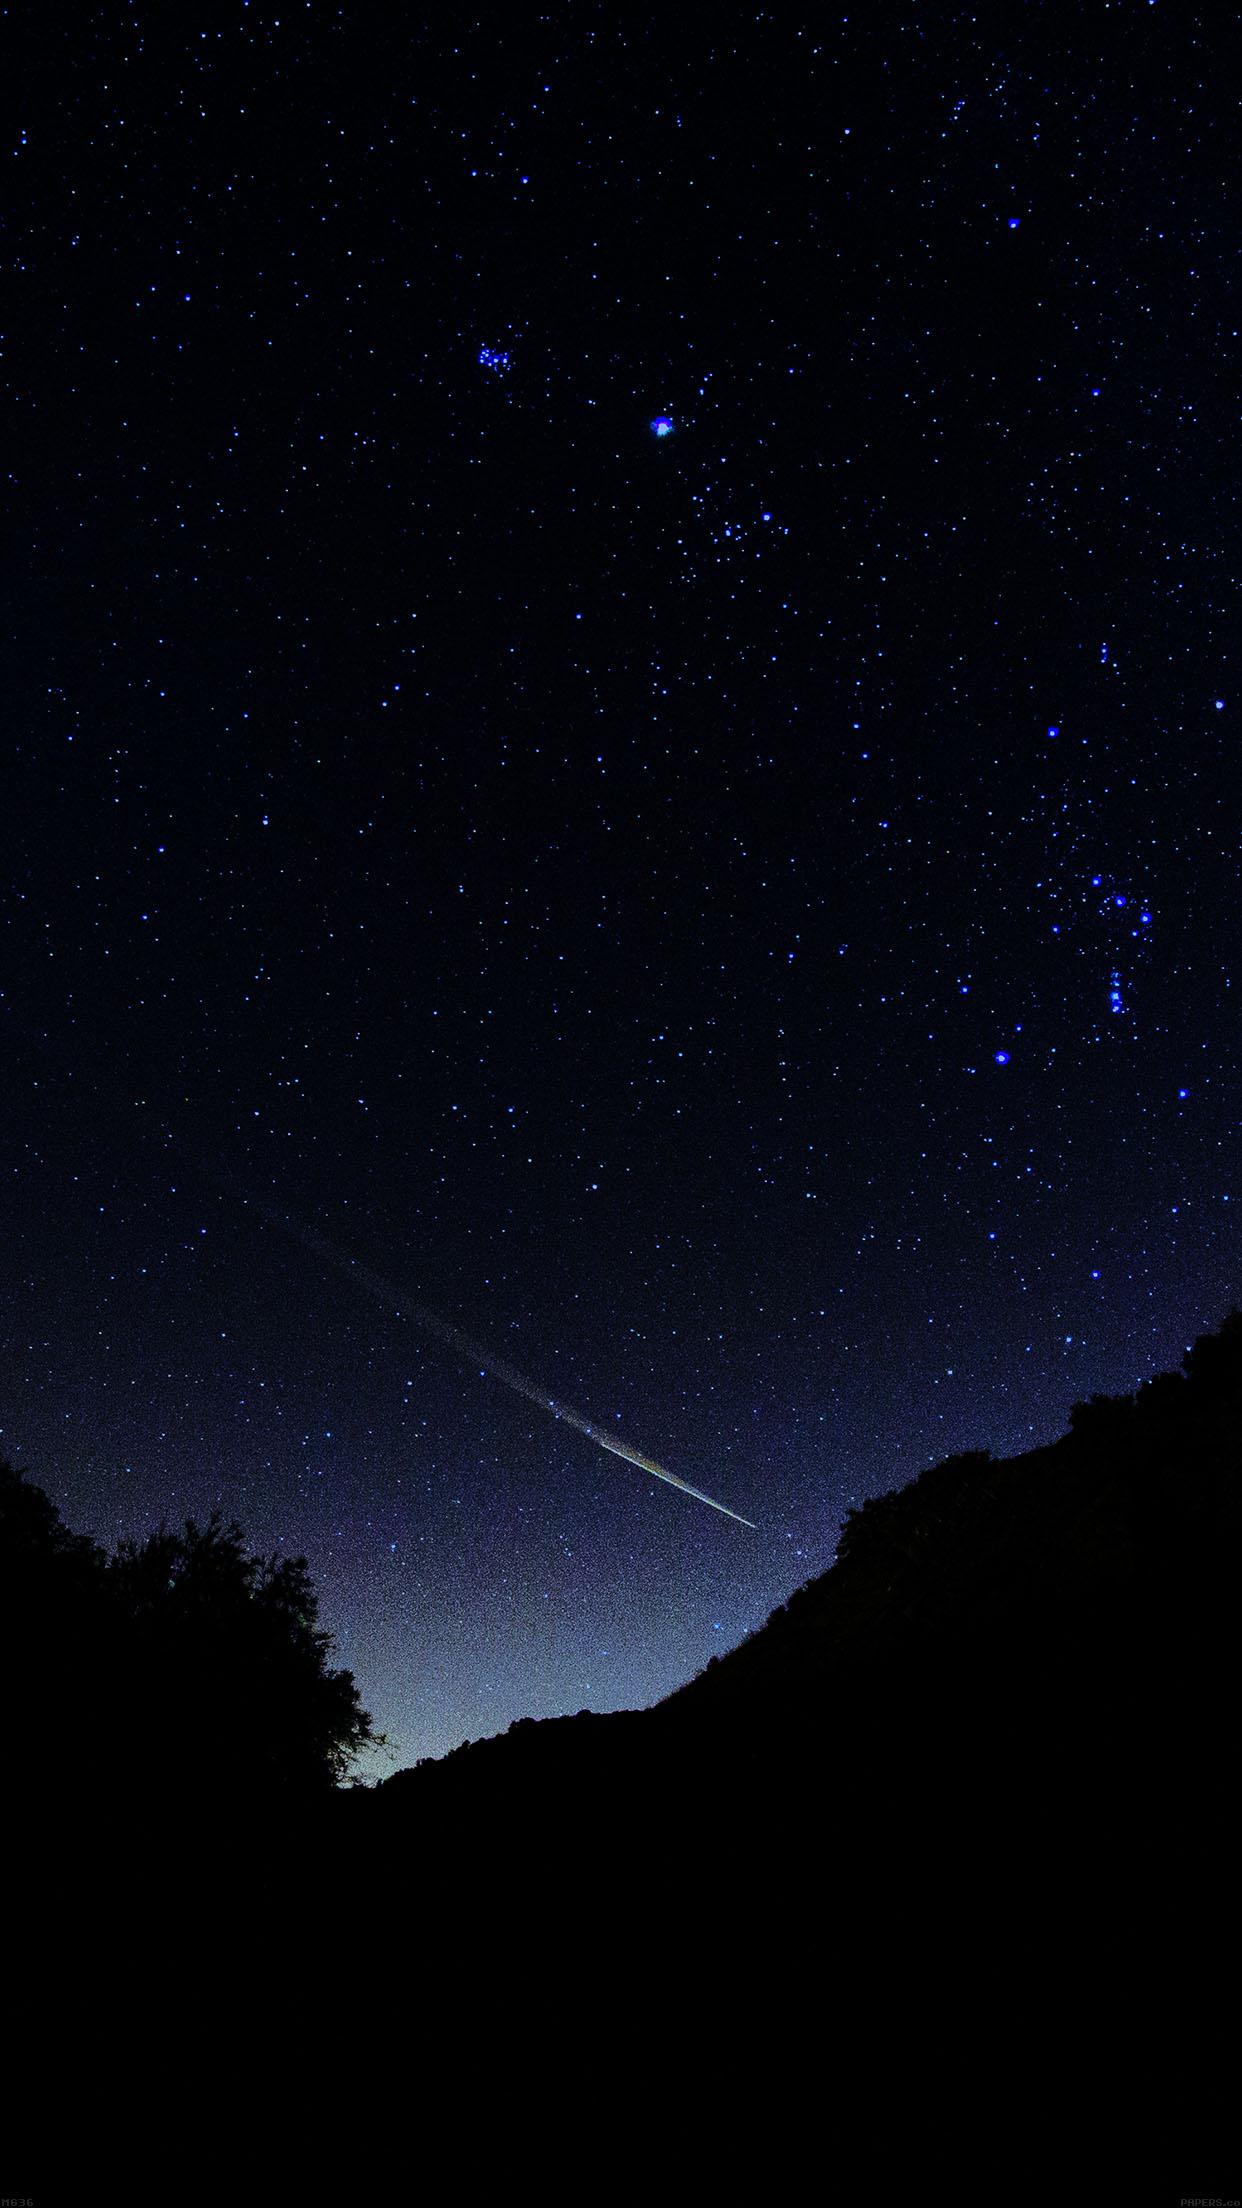 ... space-dark-sky-night-beautiful-falling-star-34-iphone6-plus-wallpaper